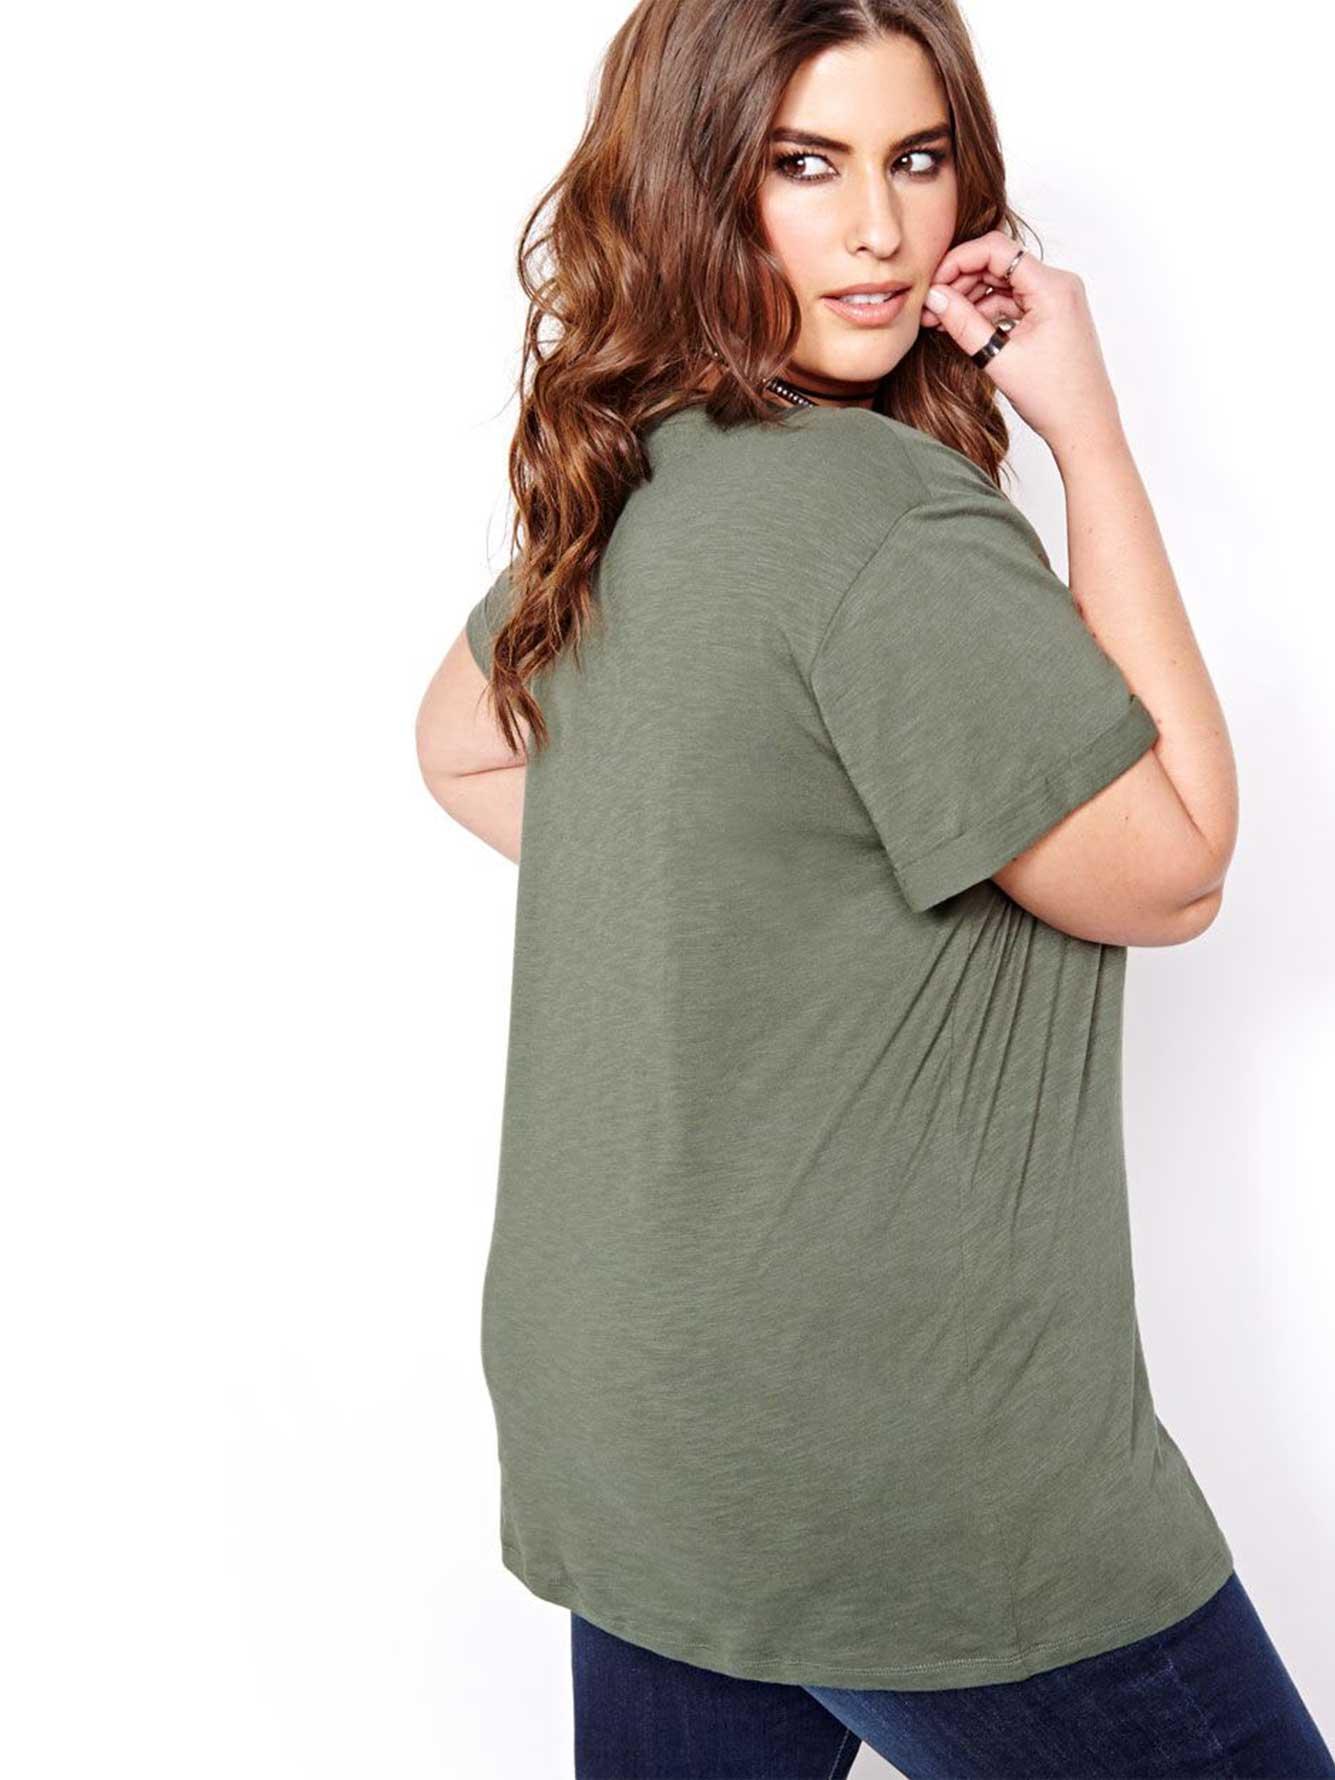 L&L Short Sleeved Boyfriend T-shirt